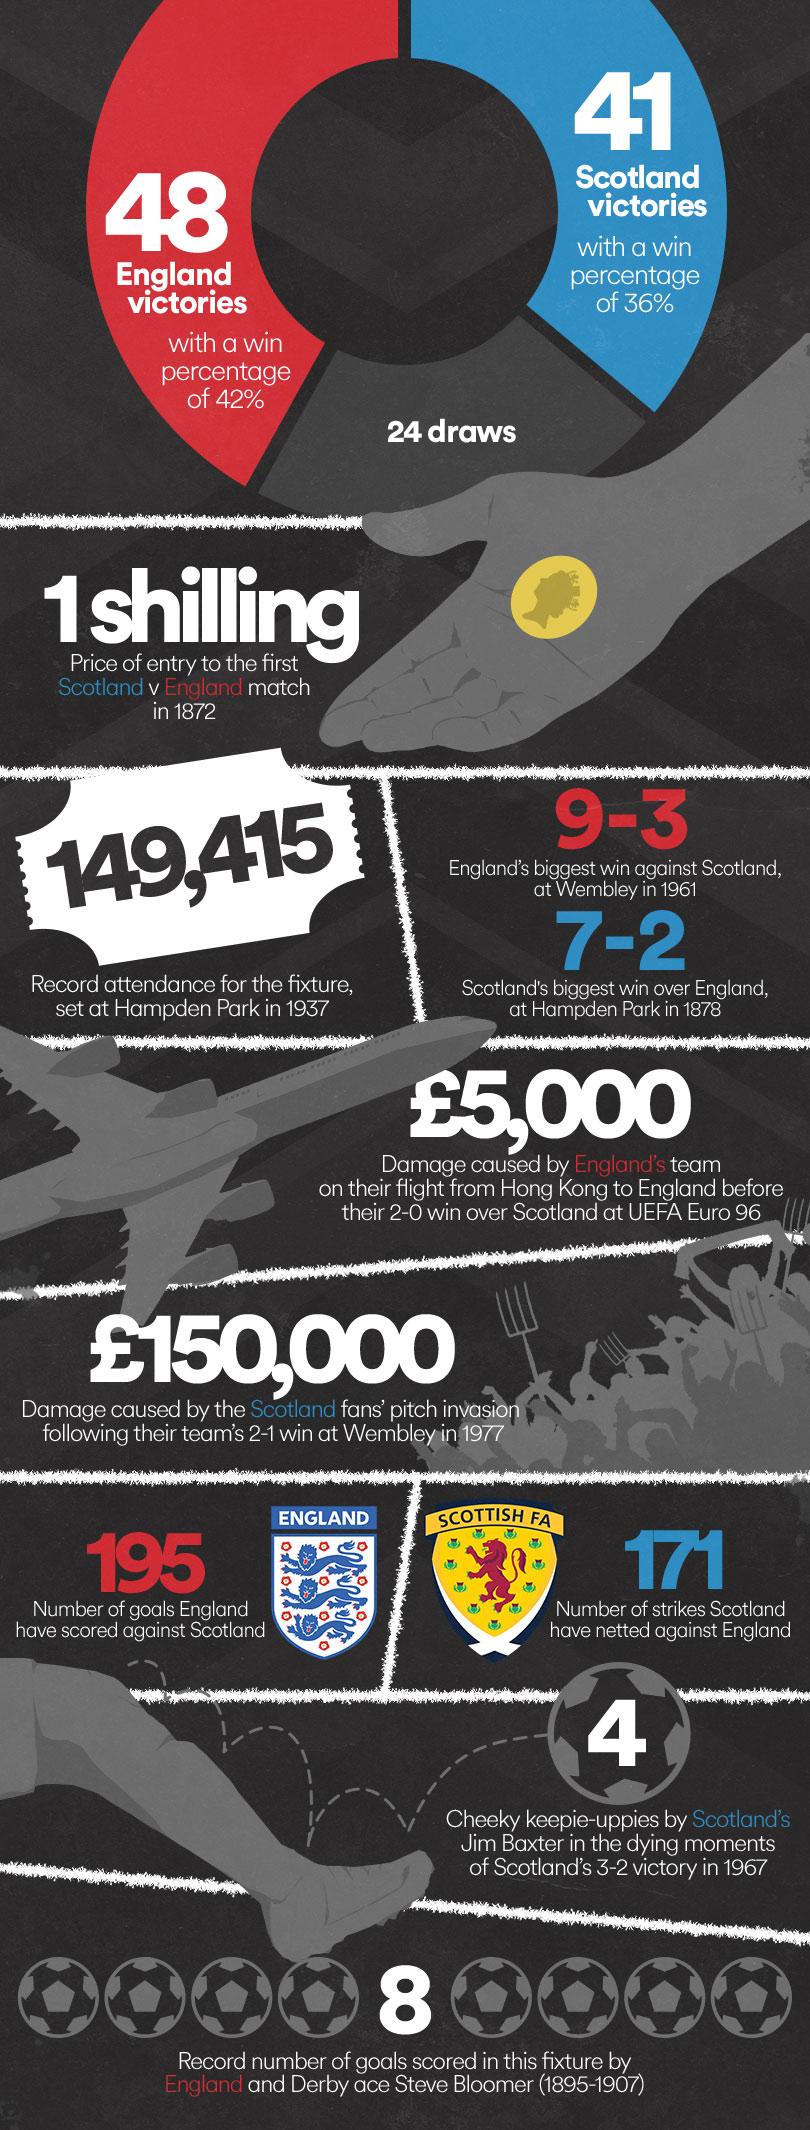 EnglandScotland_Infographic_v3.jpg